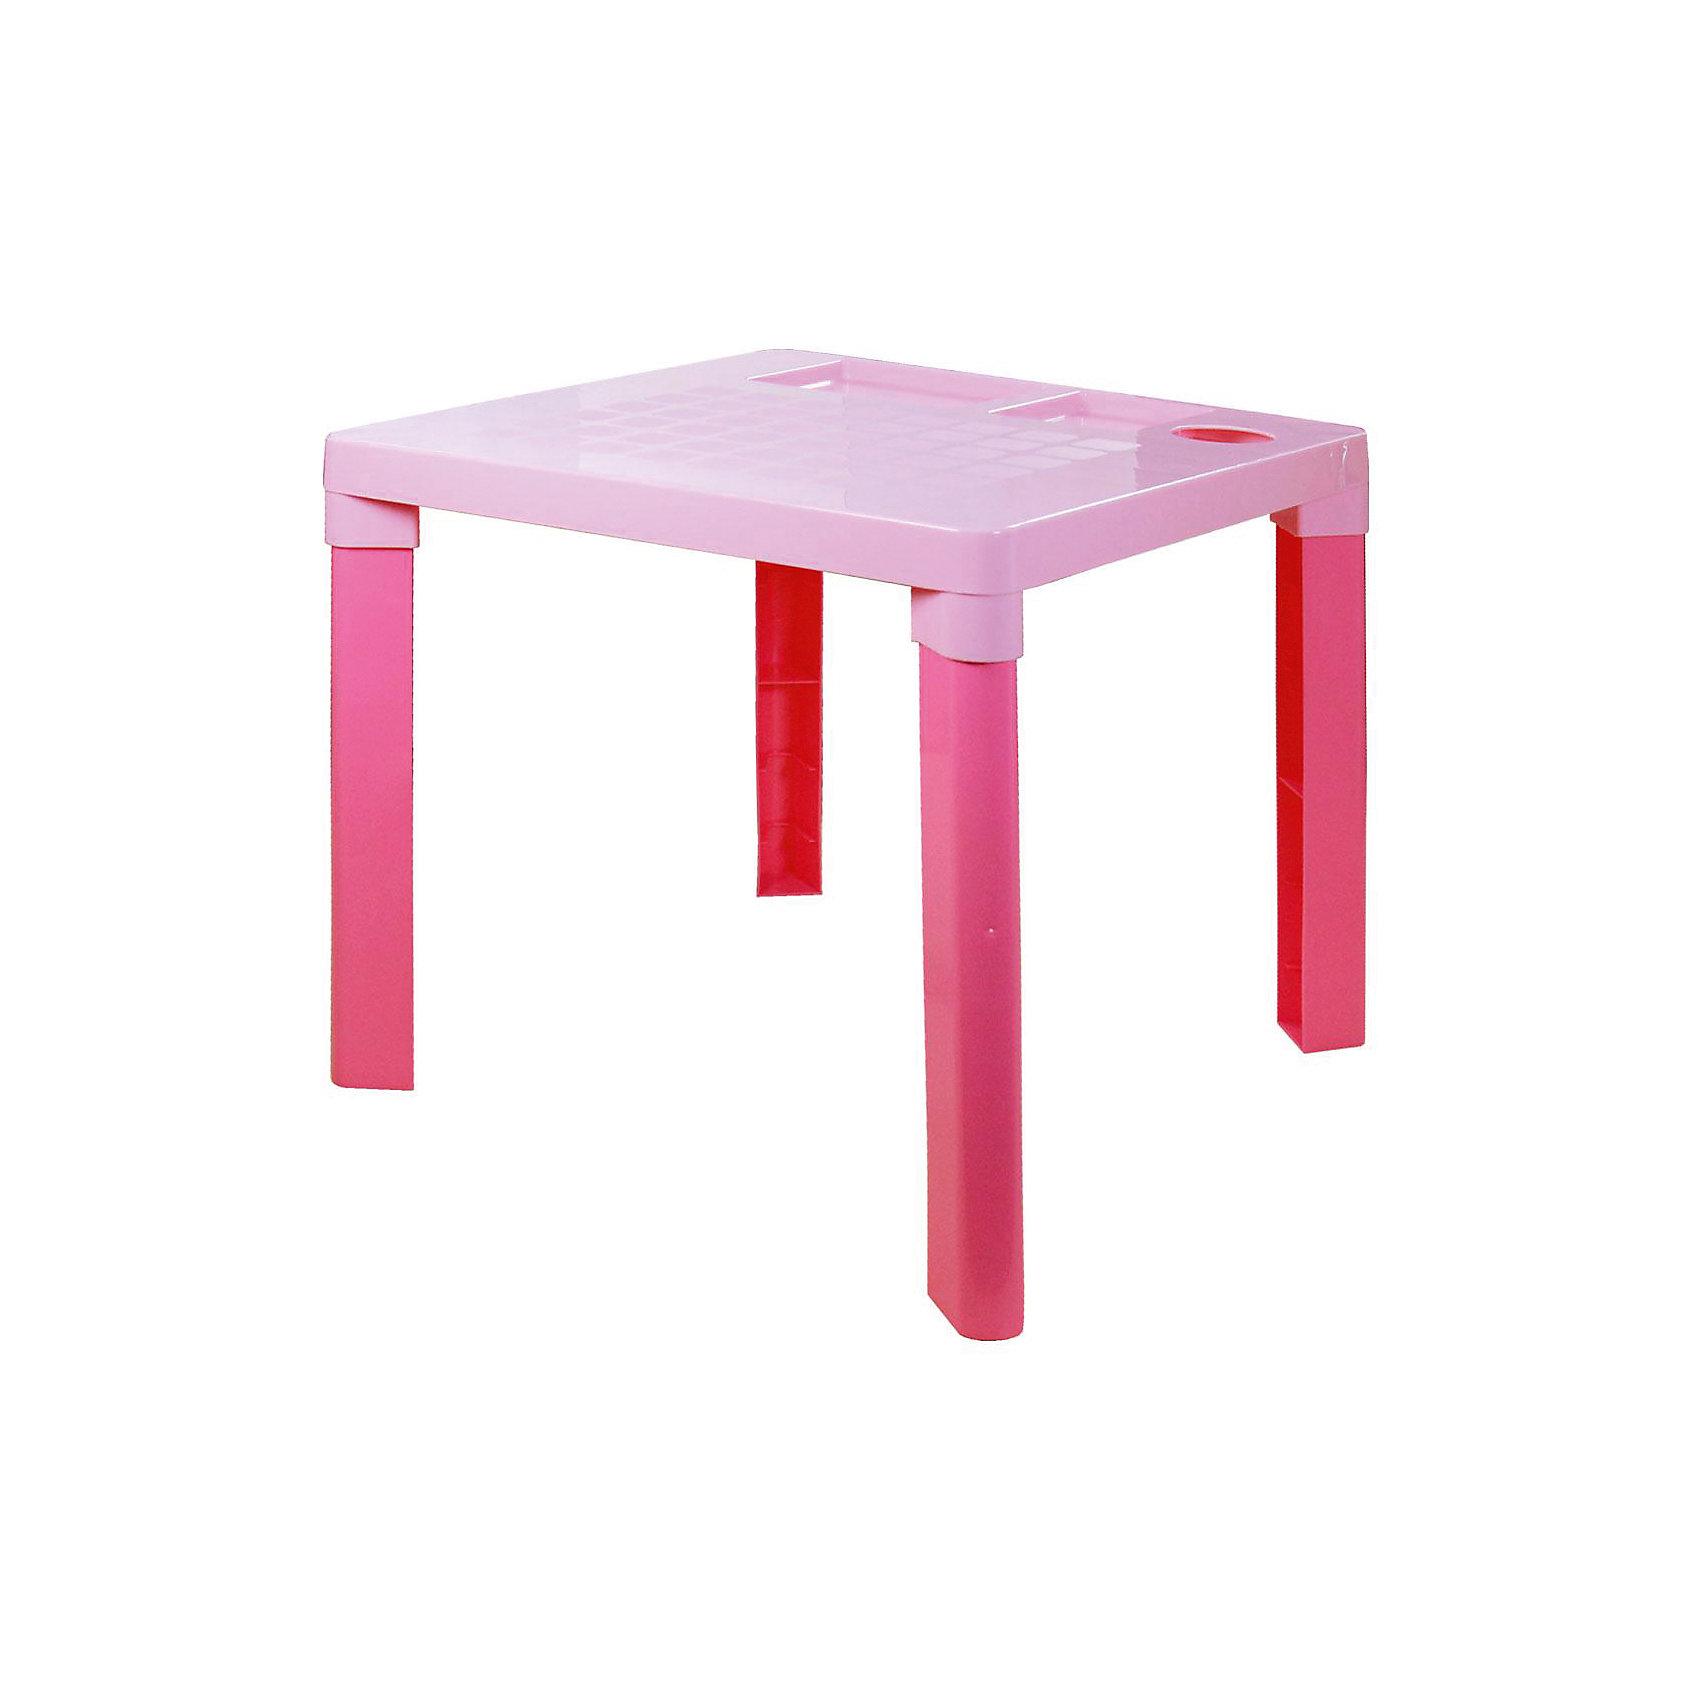 Alternativa Стол детский ,  Alternativa, розовый alternativa горка для купания alternativa розовый